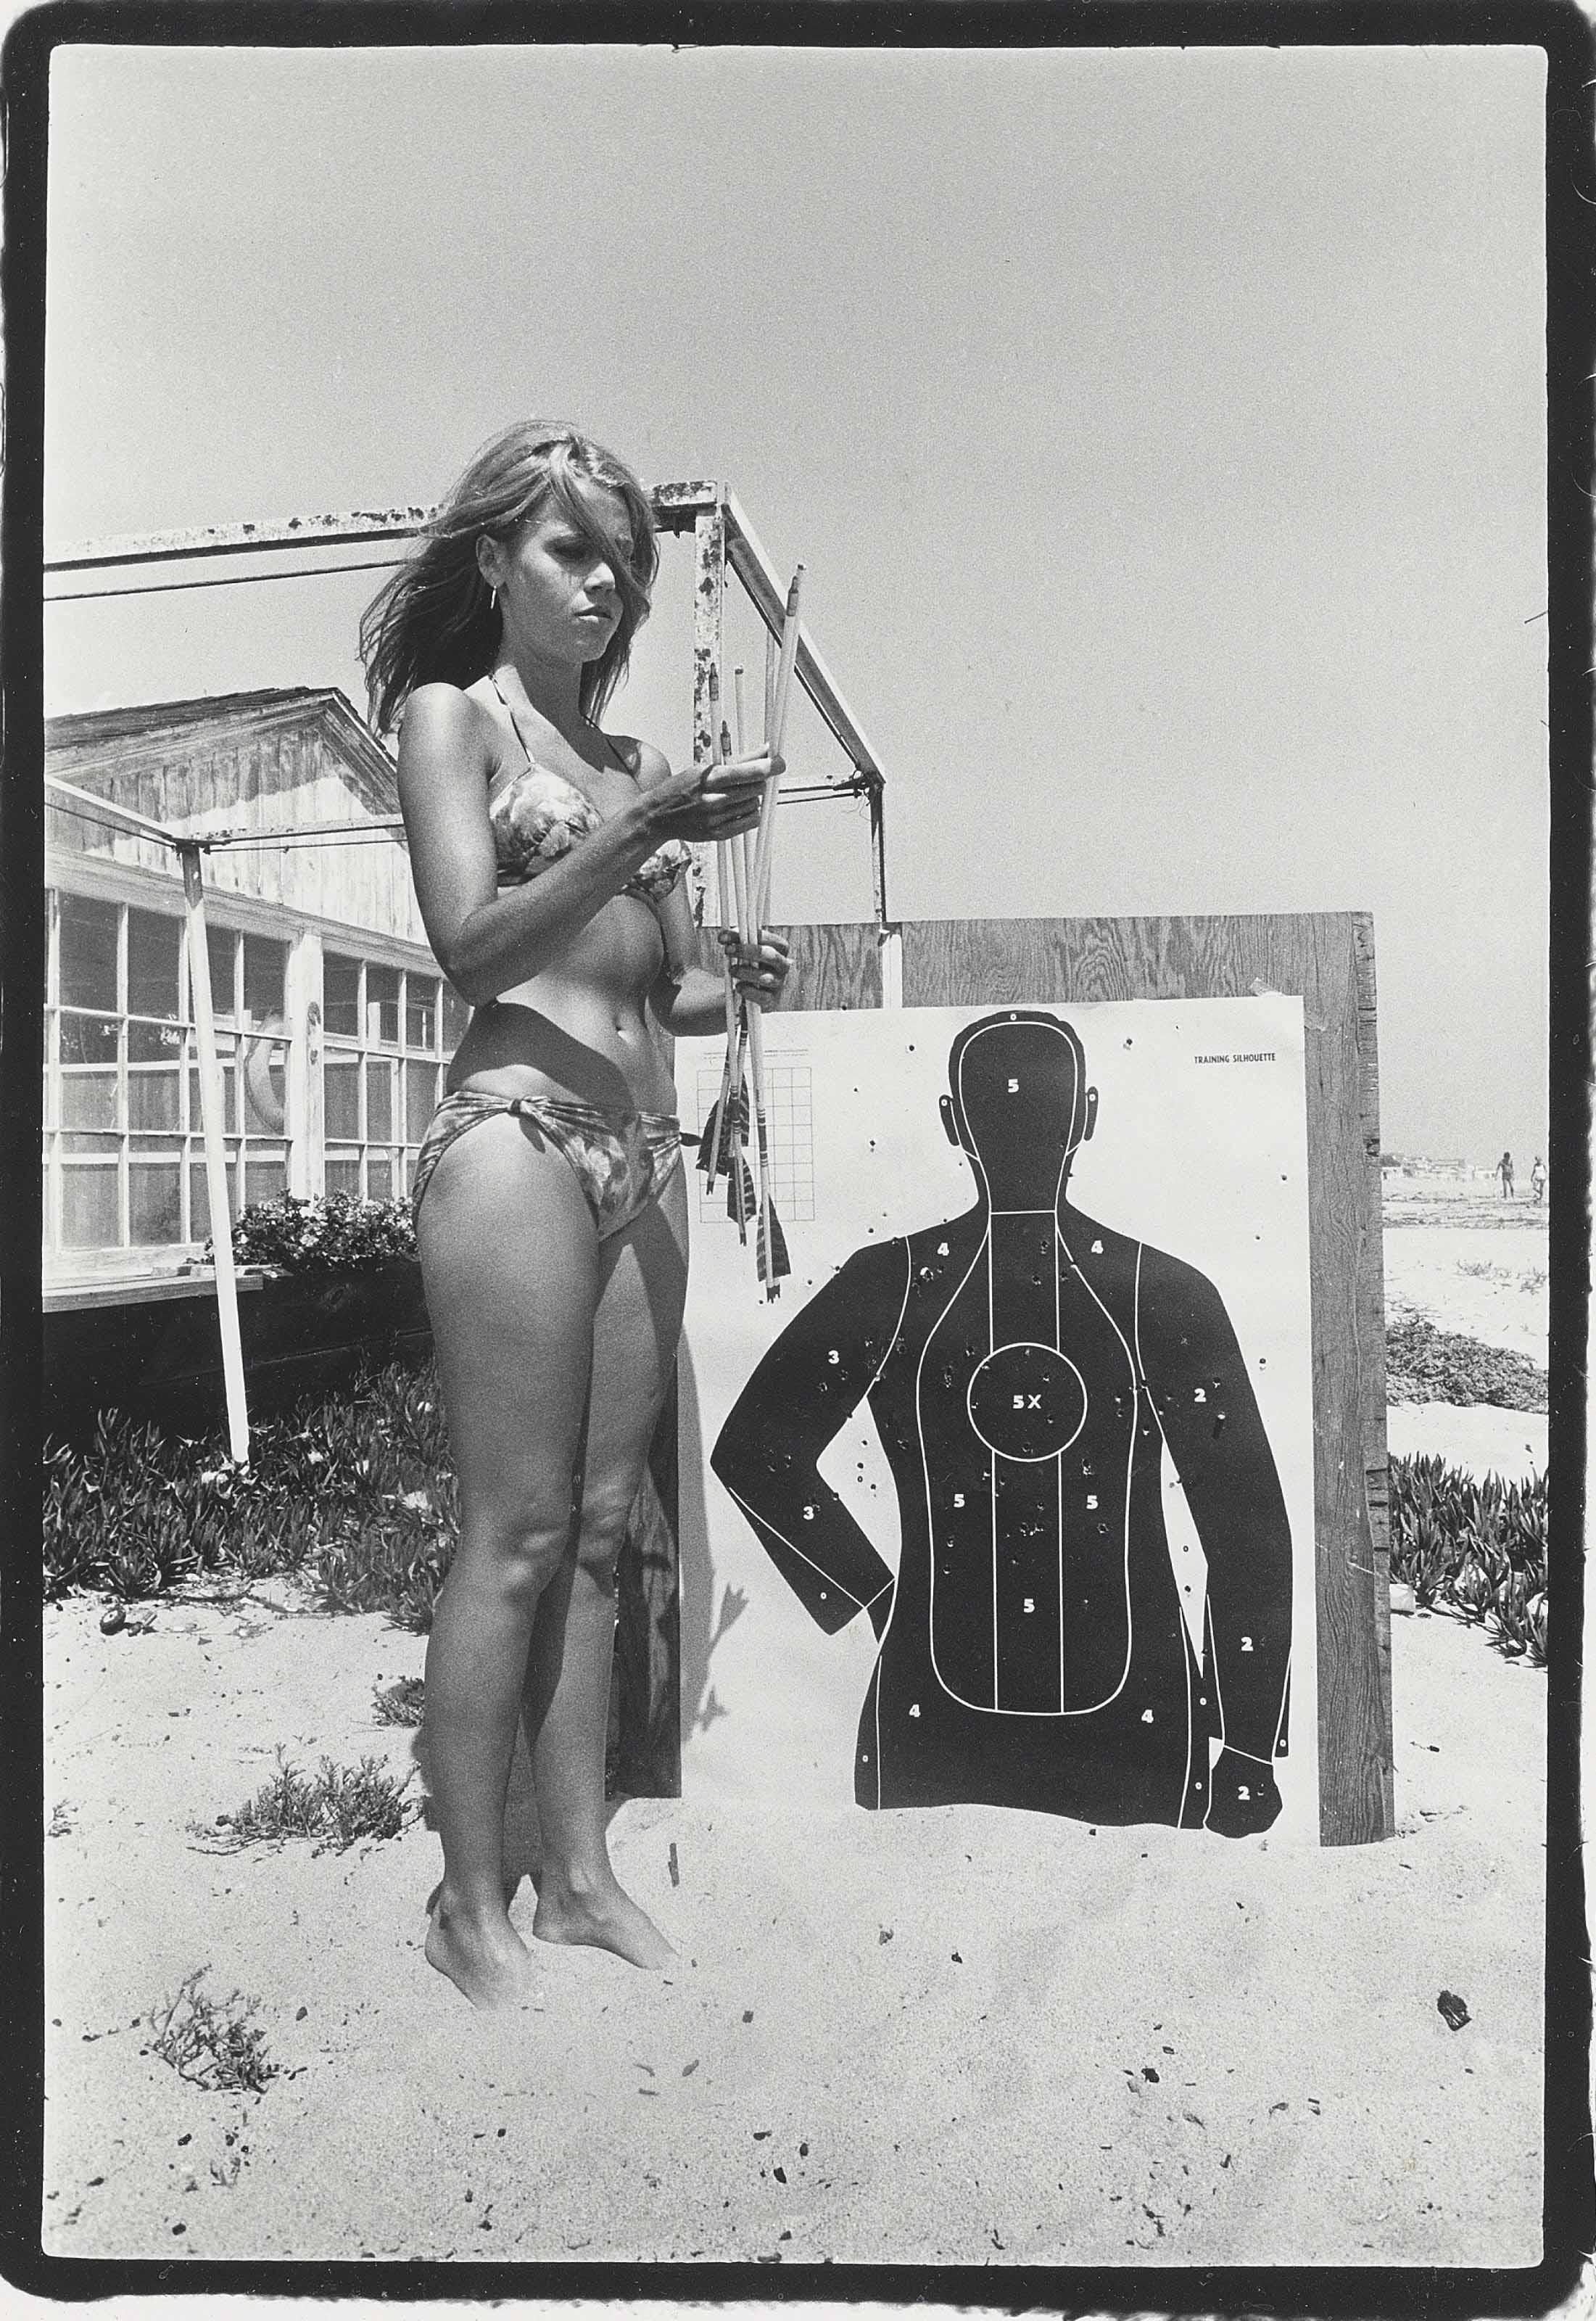 Jane Fonda with Target, 1965